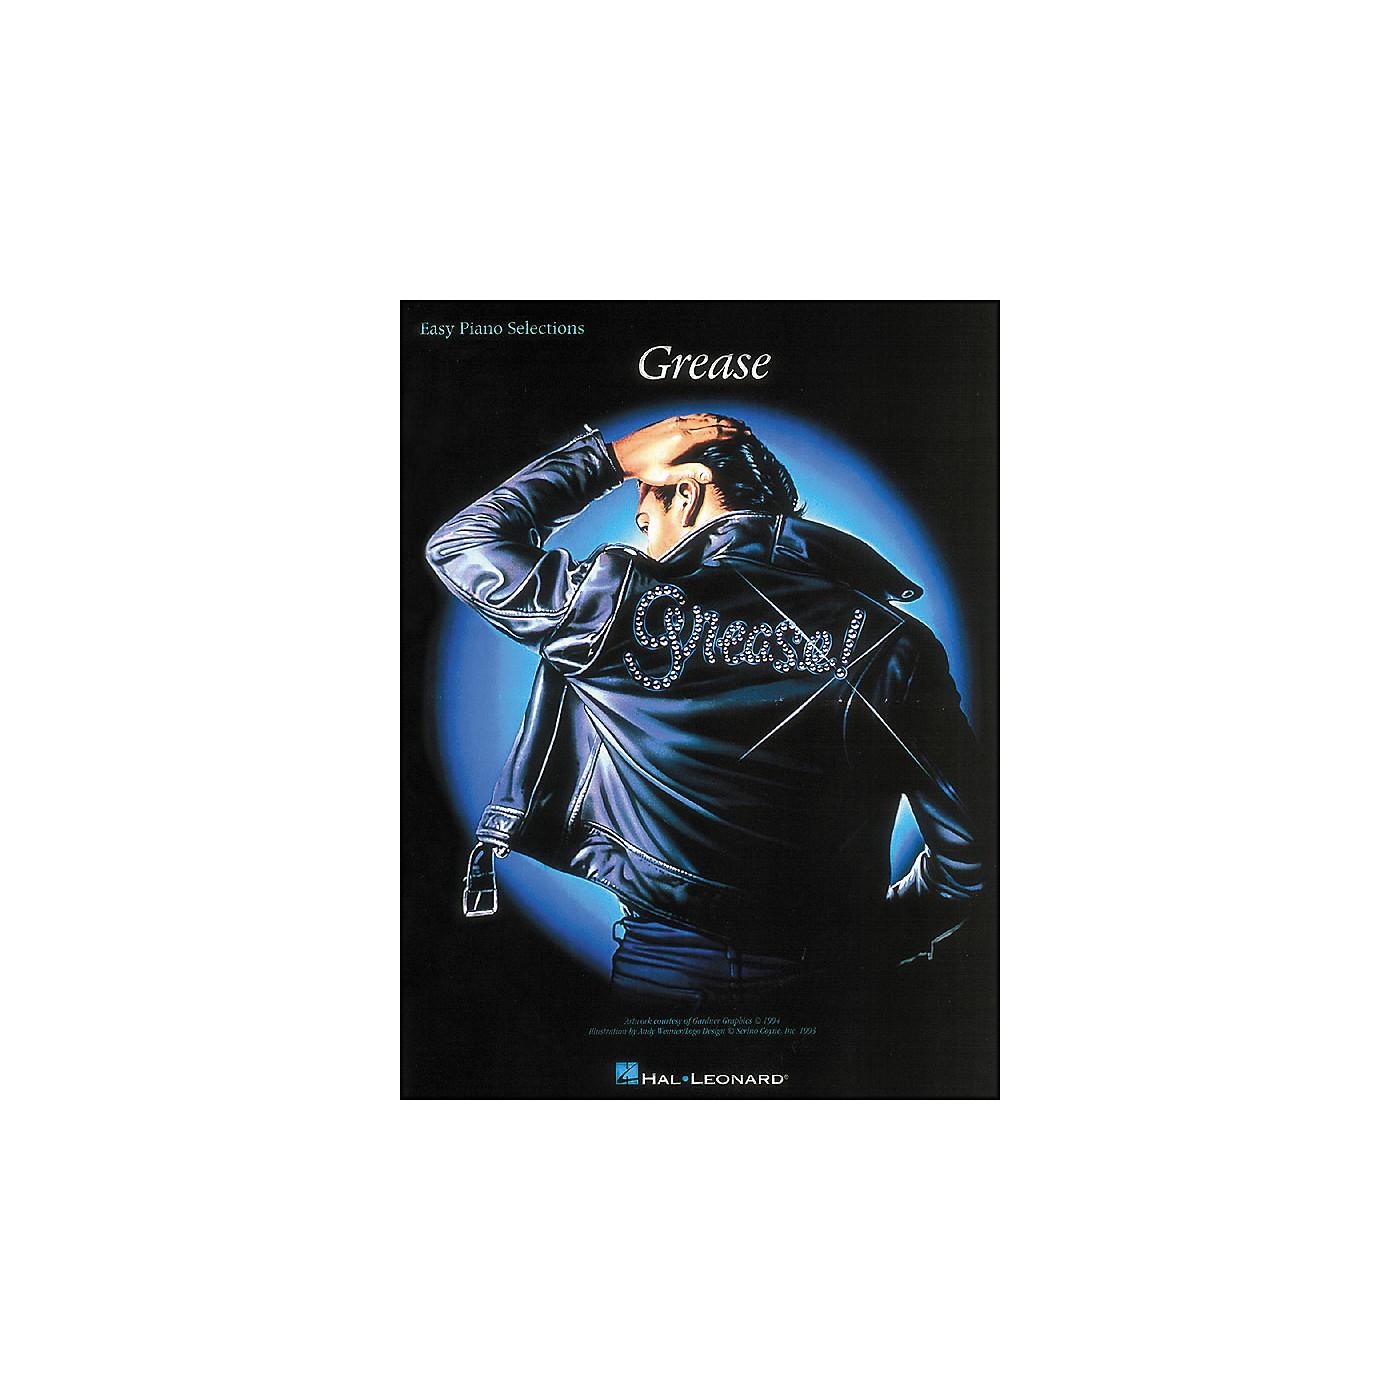 Hal Leonard Grease: Easy Piano Selections Songbook thumbnail